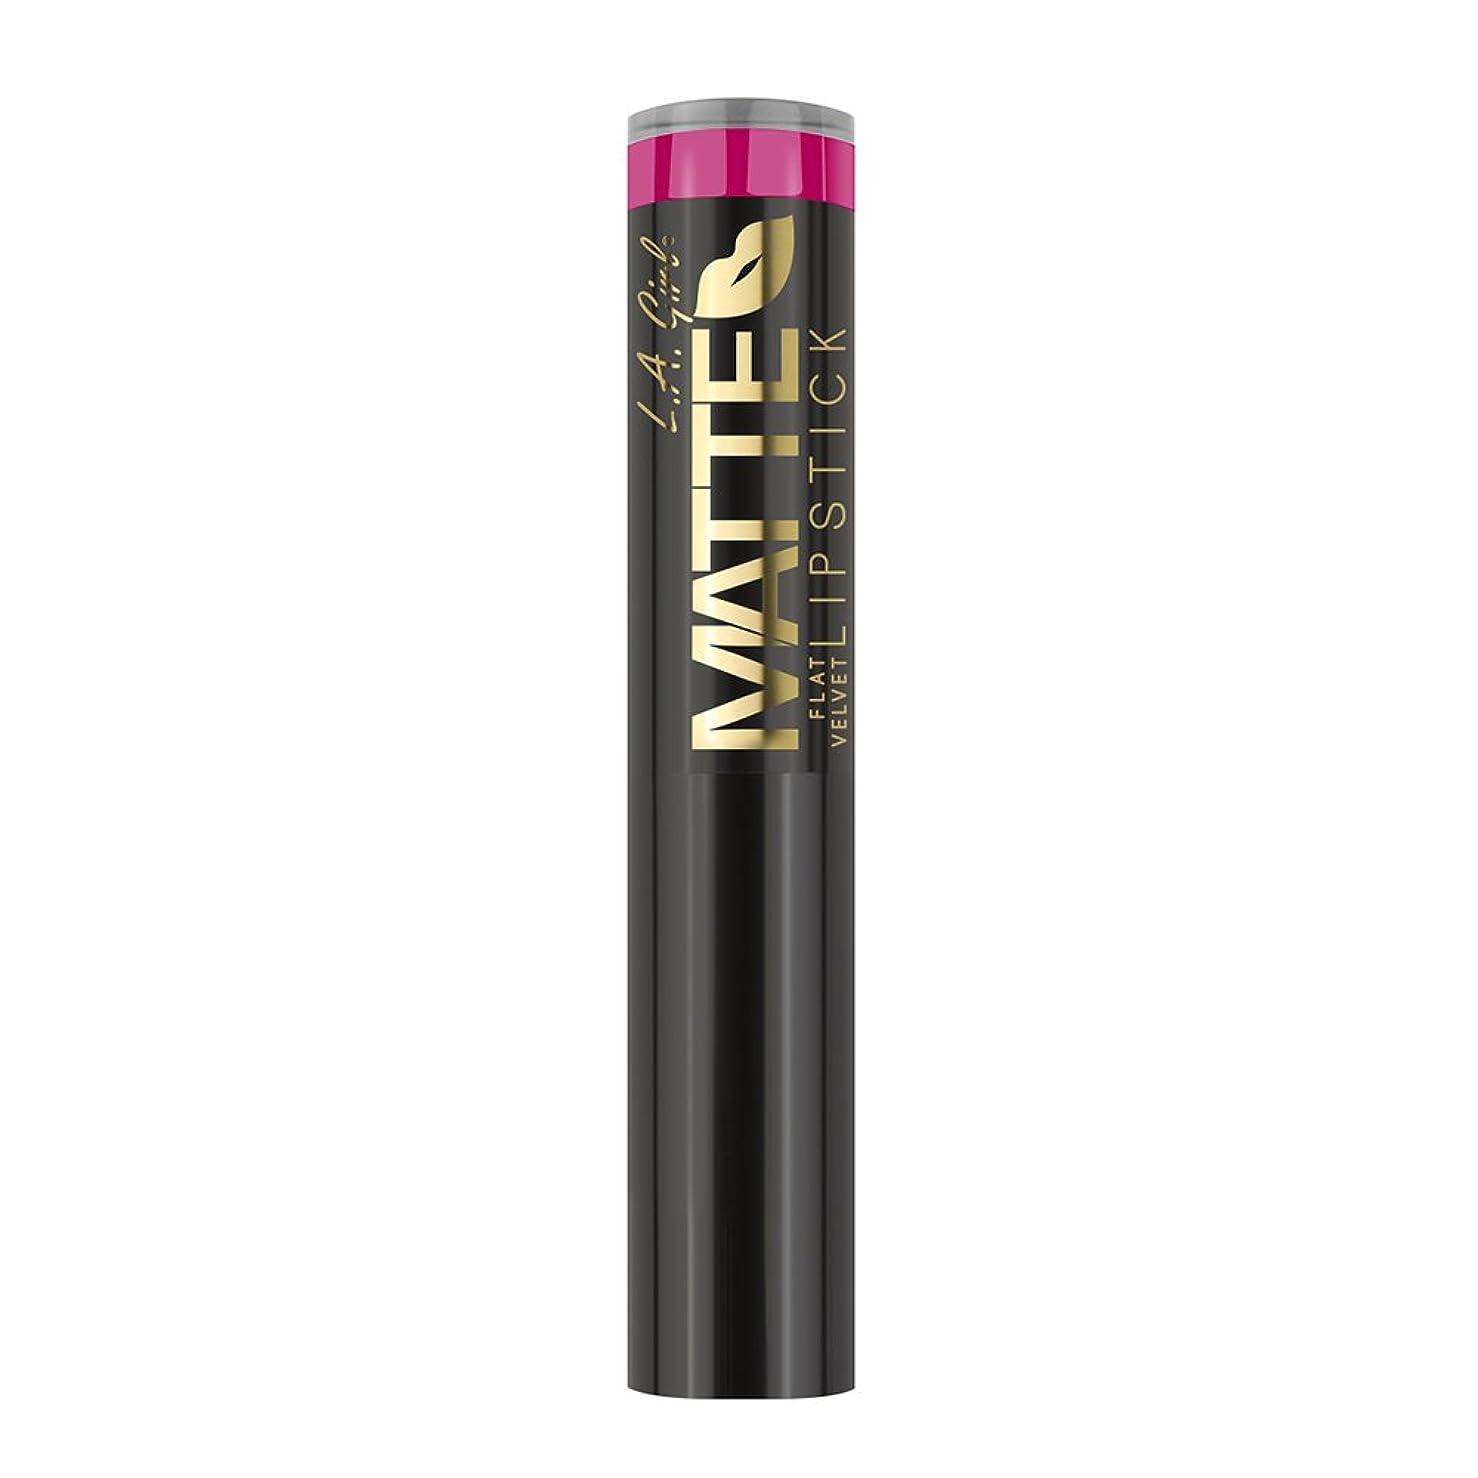 警官原子炉読む(3 Pack) L.A. GIRL Matte Flat Velvet Lipstick - Bliss (並行輸入品)